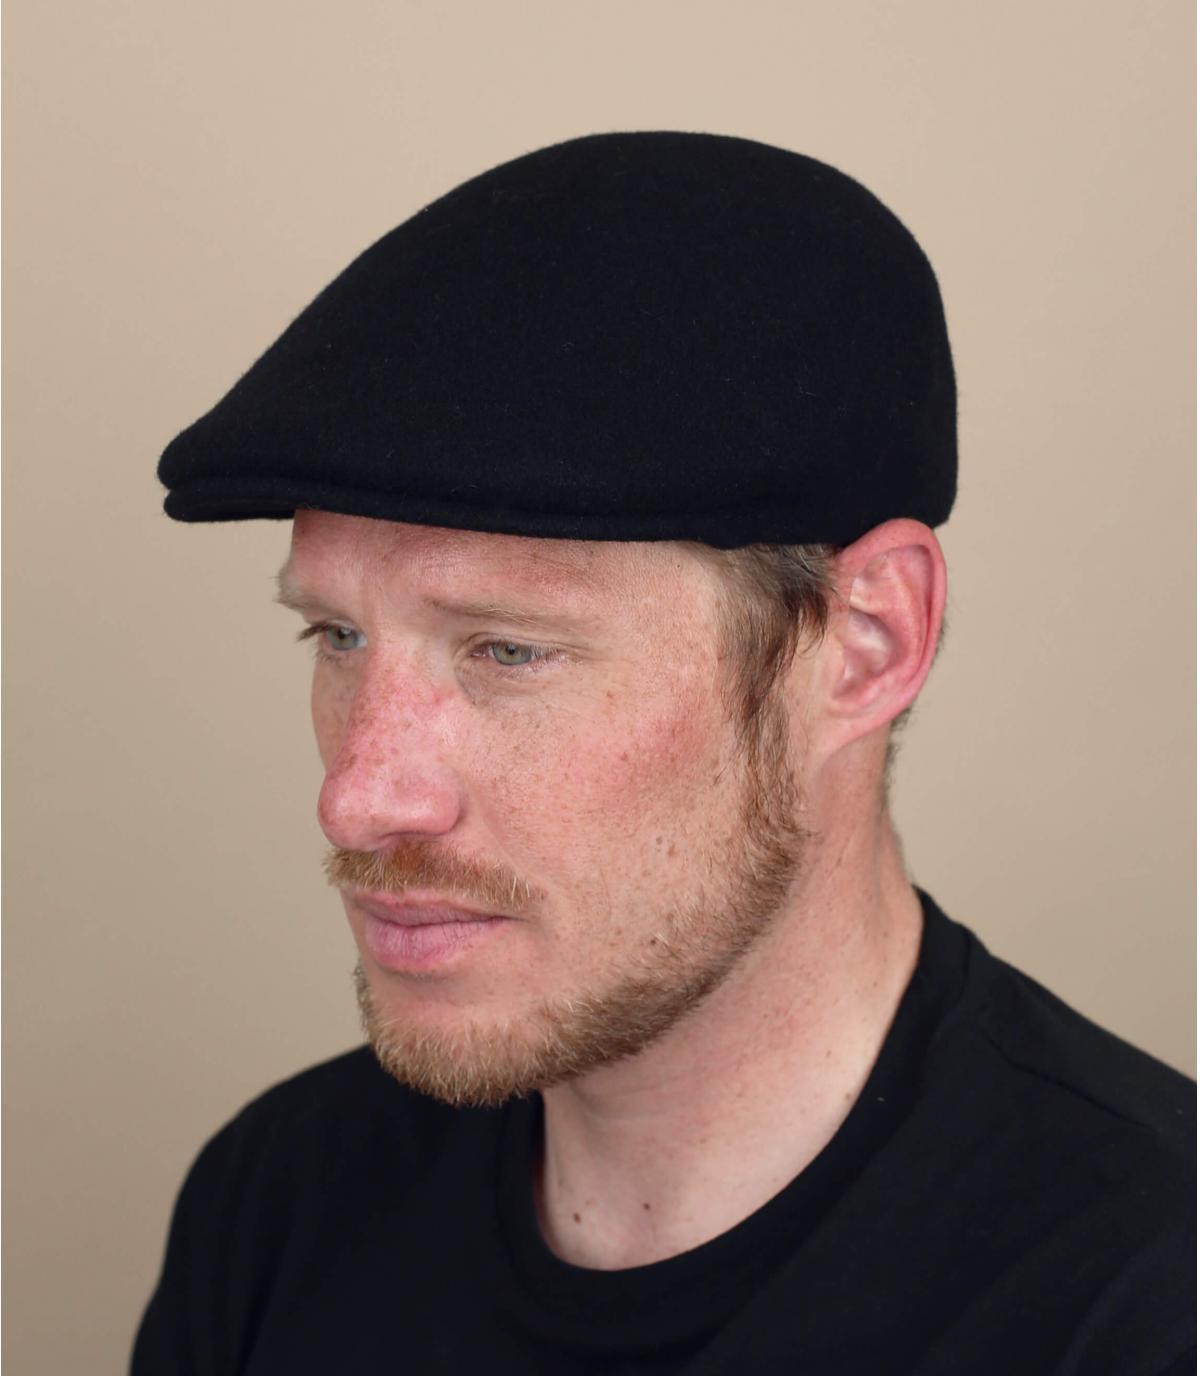 Black 507 ivy cap